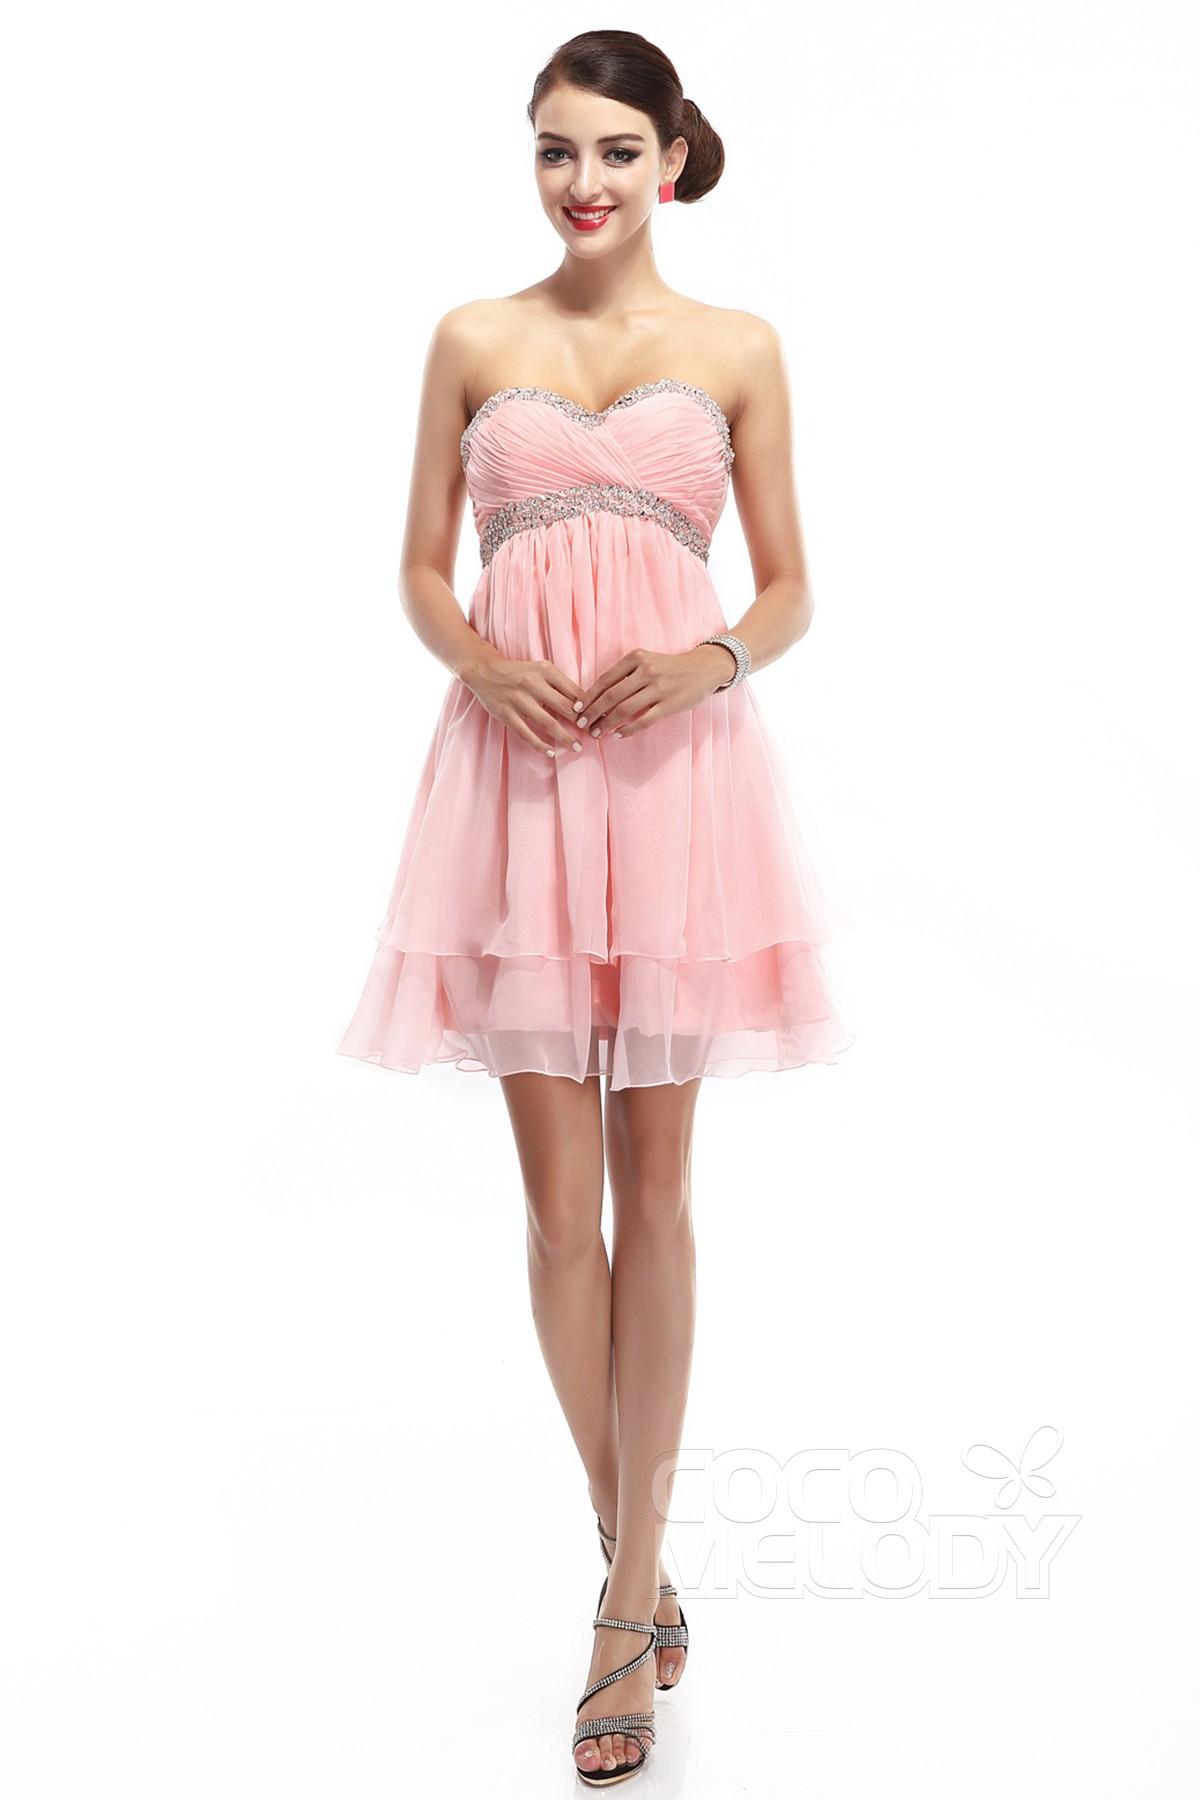 A-Line Sweetheart Empire Short-Mini Chiffon Primrose Pink Sleeveless Zipper Party Dresses COZM14016